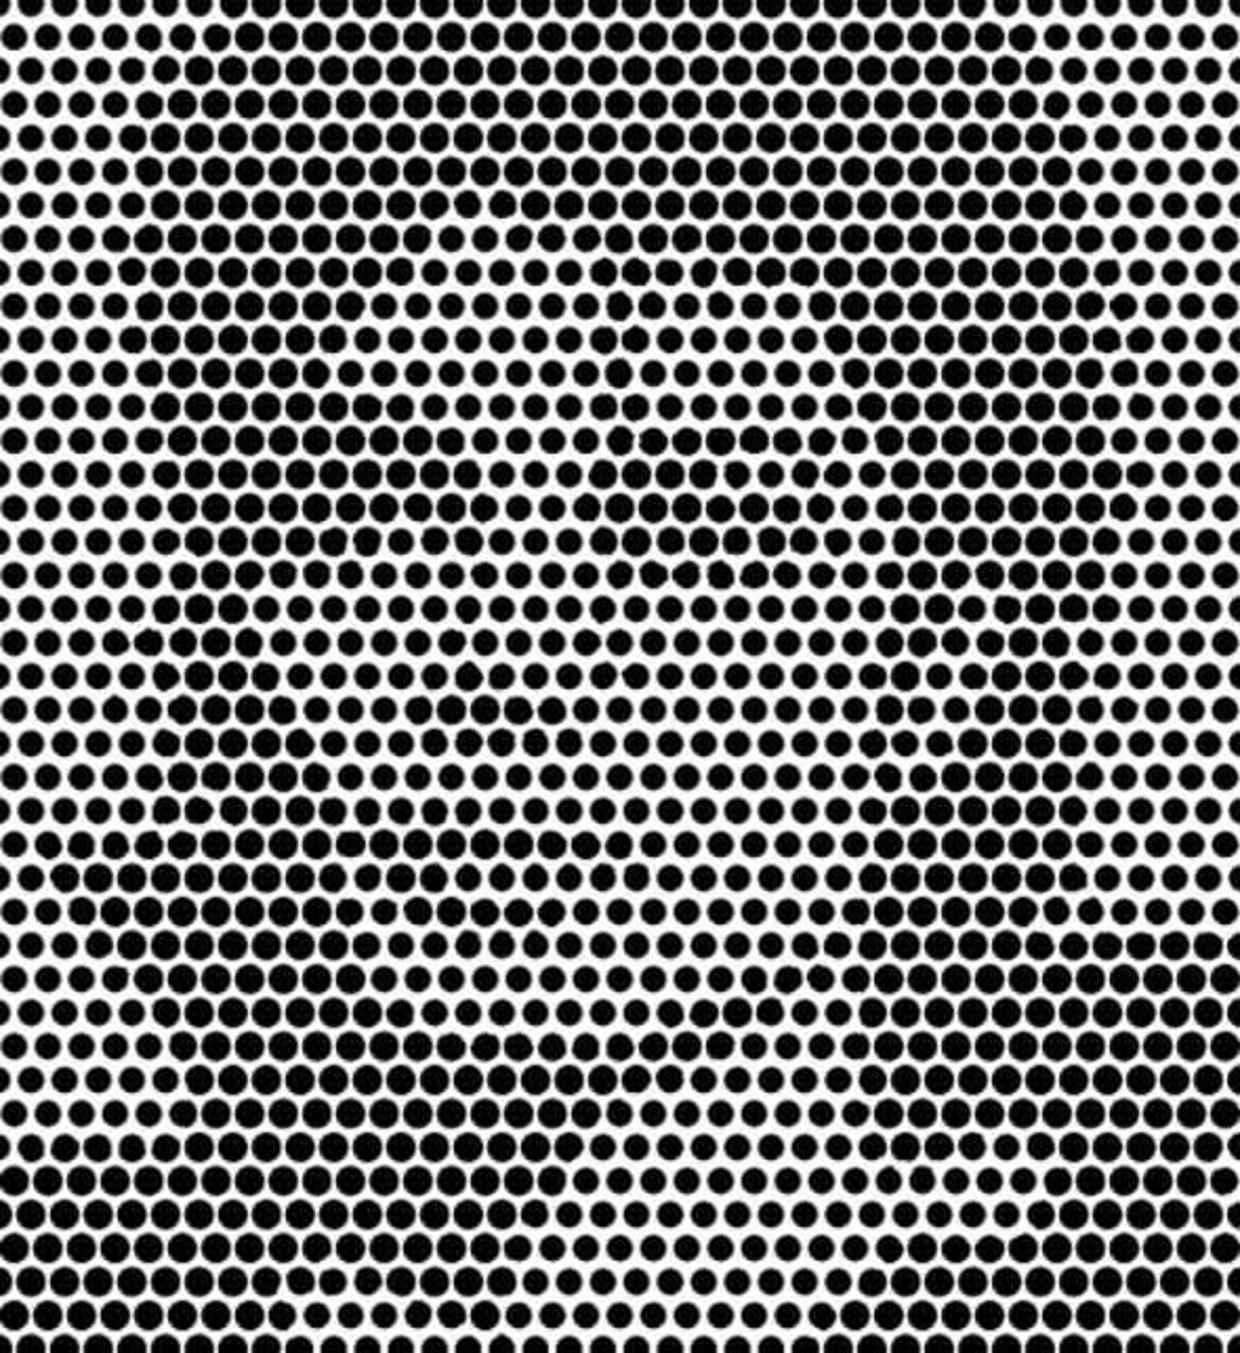 optical illusions 13